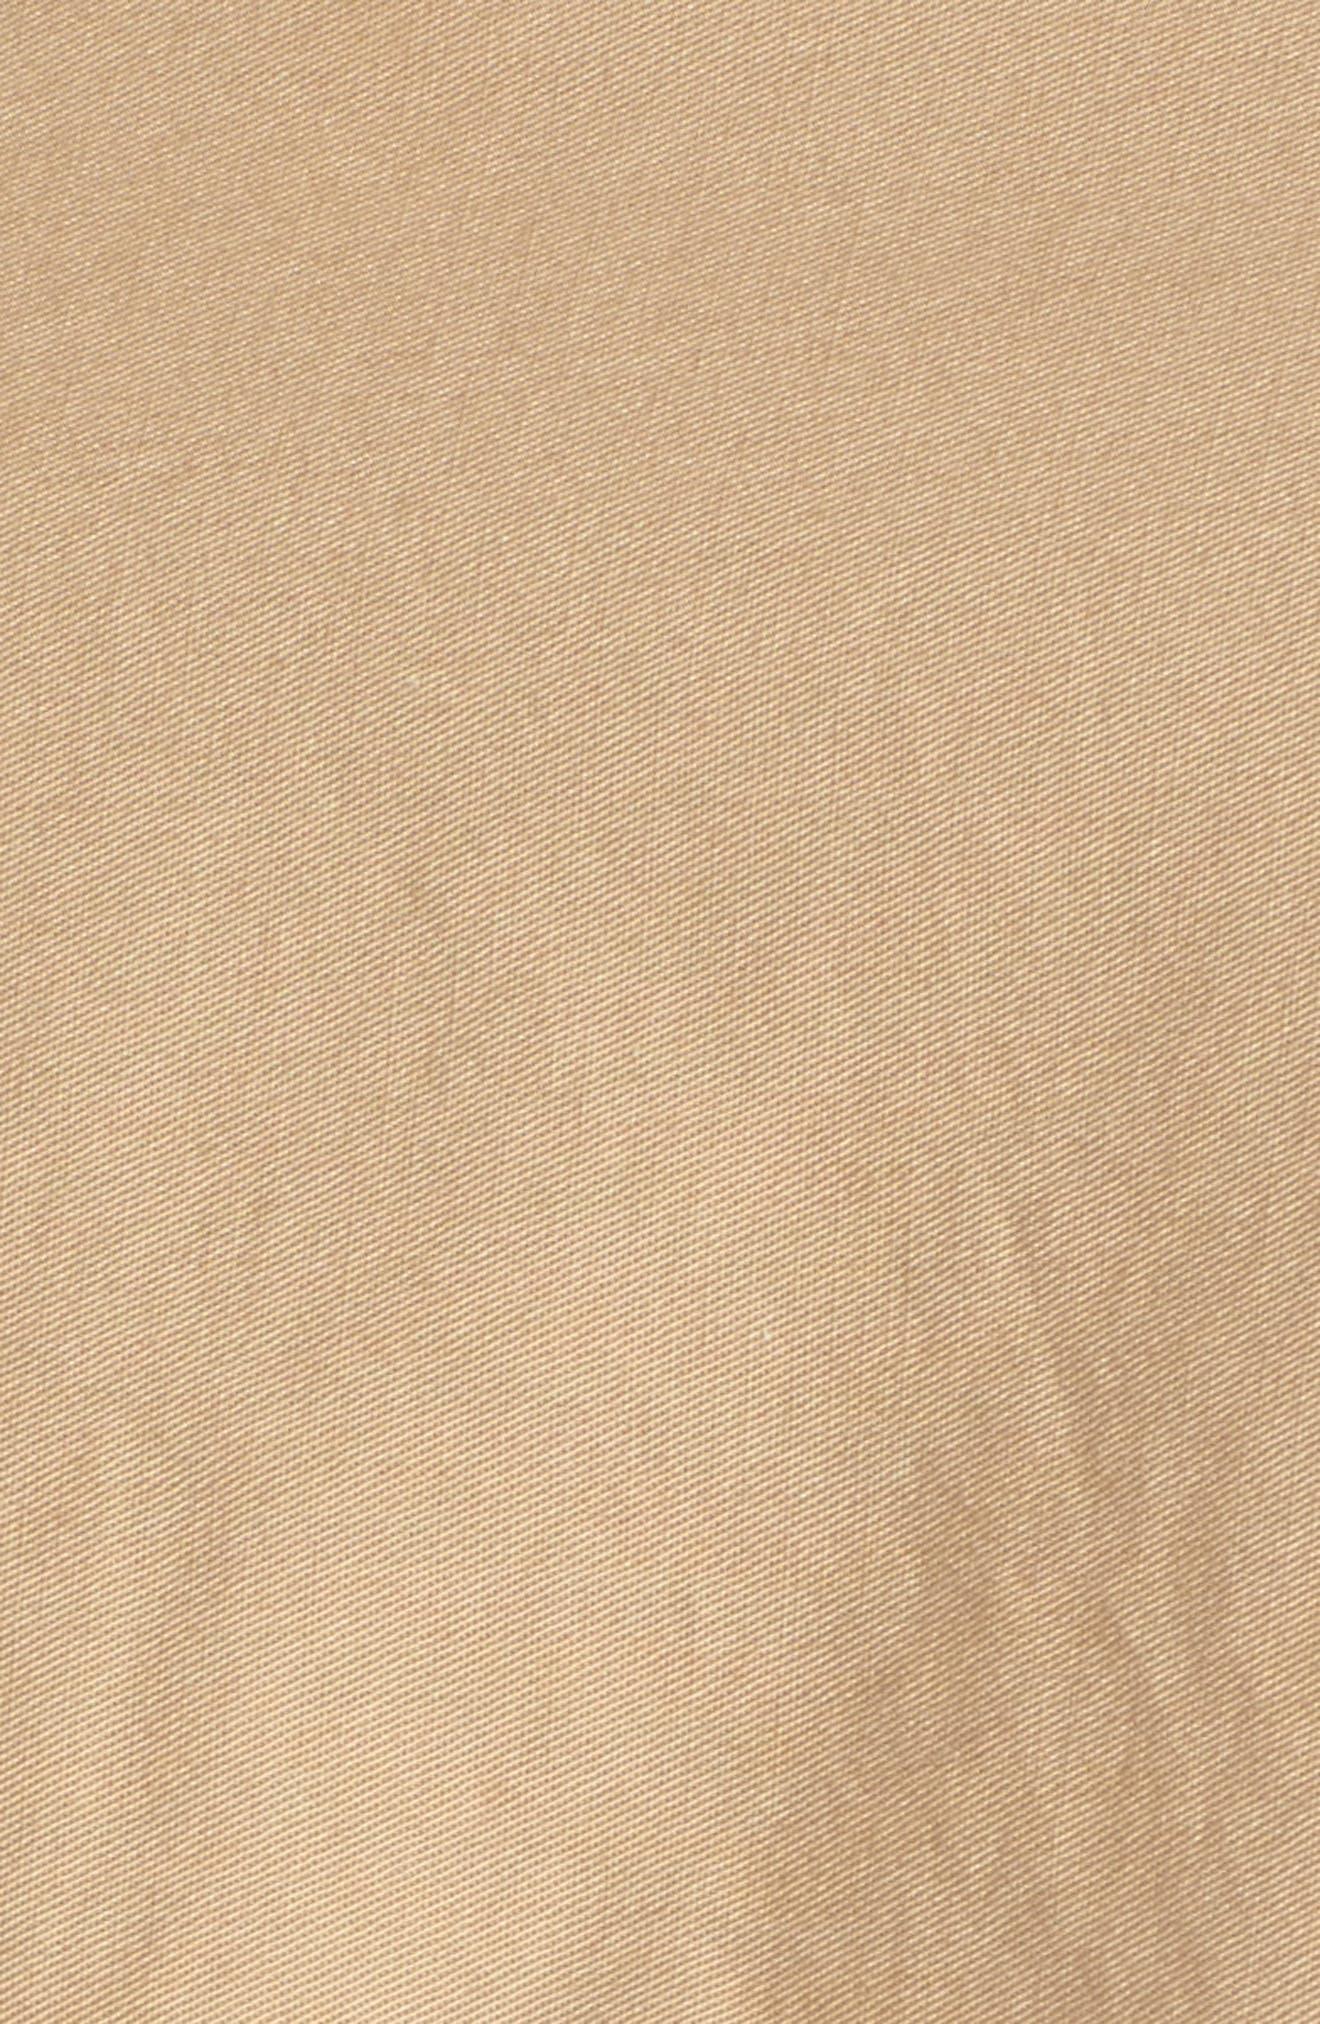 Crop Trench Coat,                             Alternate thumbnail 5, color,                             Beige Nougat